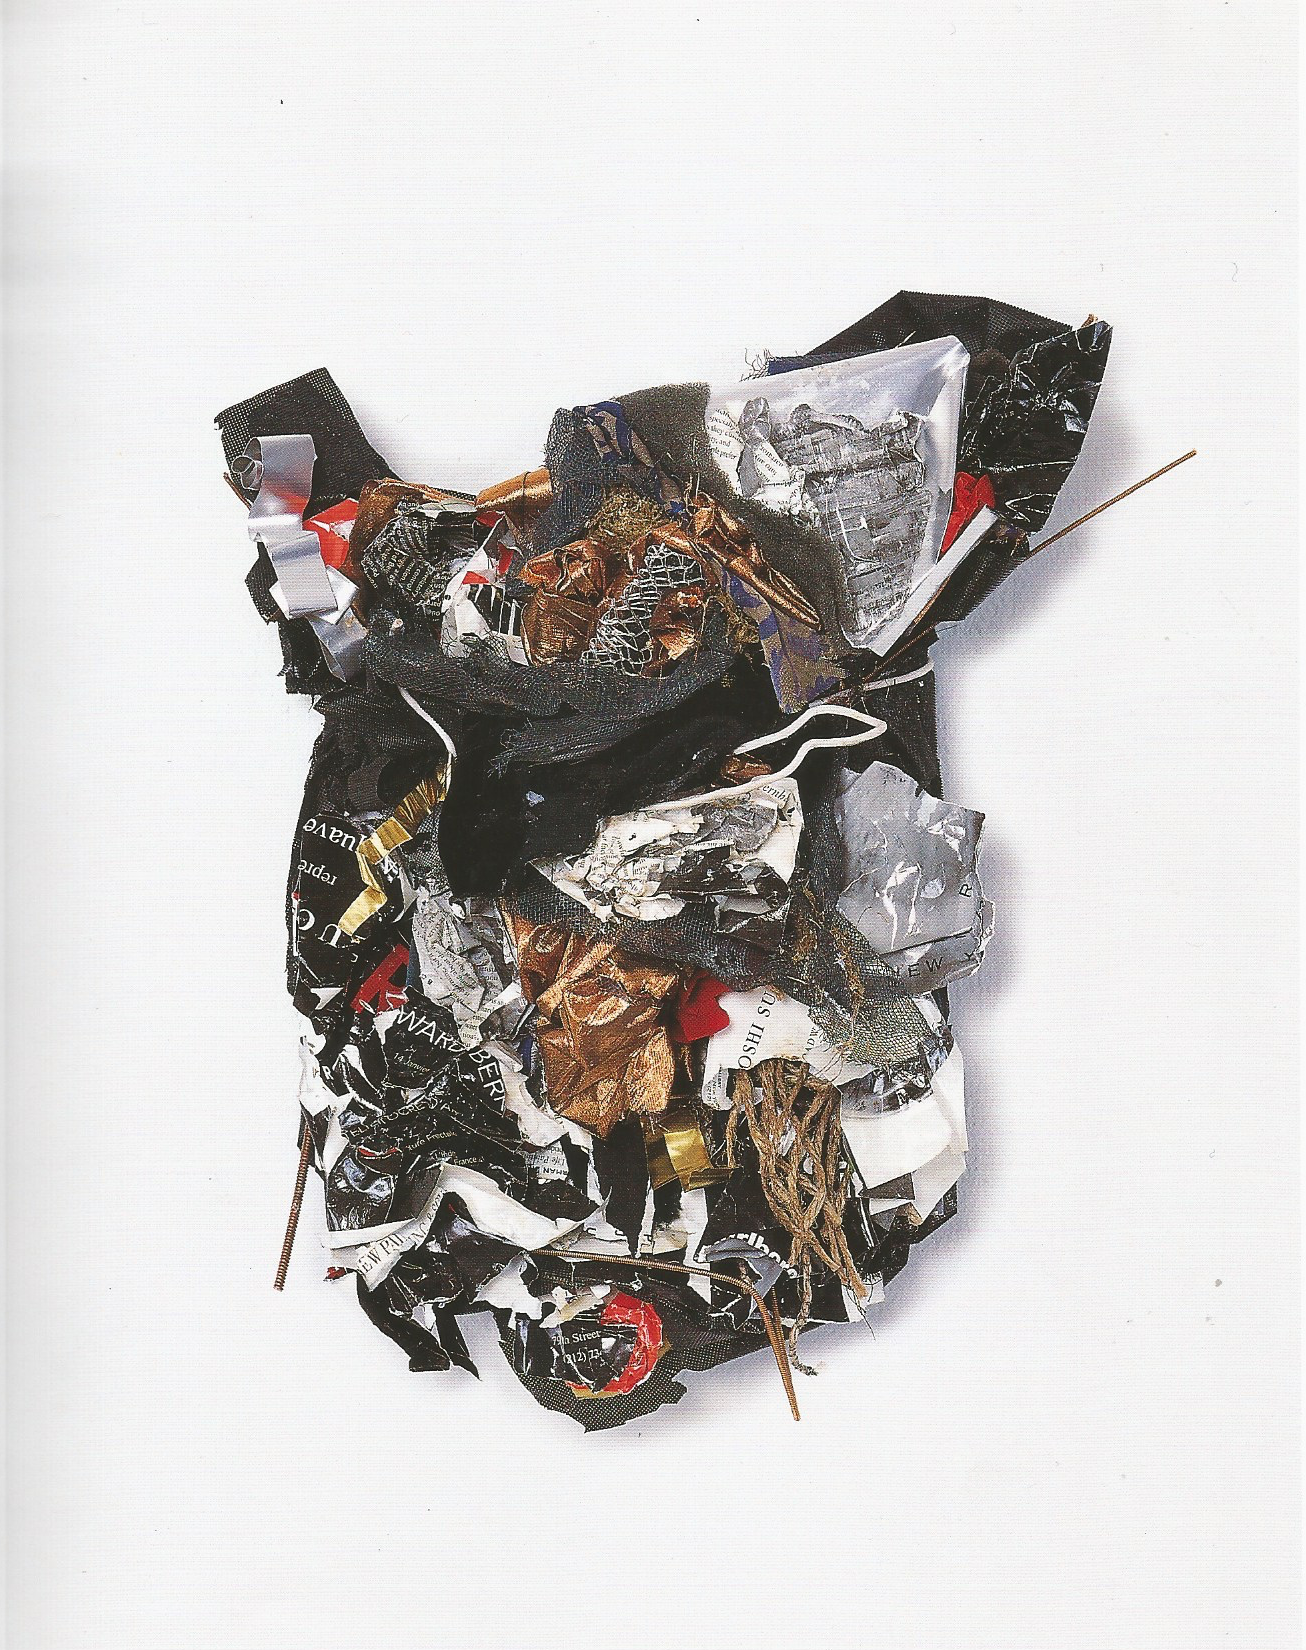 "Re née Lerner: Torso W/rods   ,  Fabric, paper, wire, mesh, metal, hemp, copper rpds on wood, 20"" x 18"" x 5'', 2001"